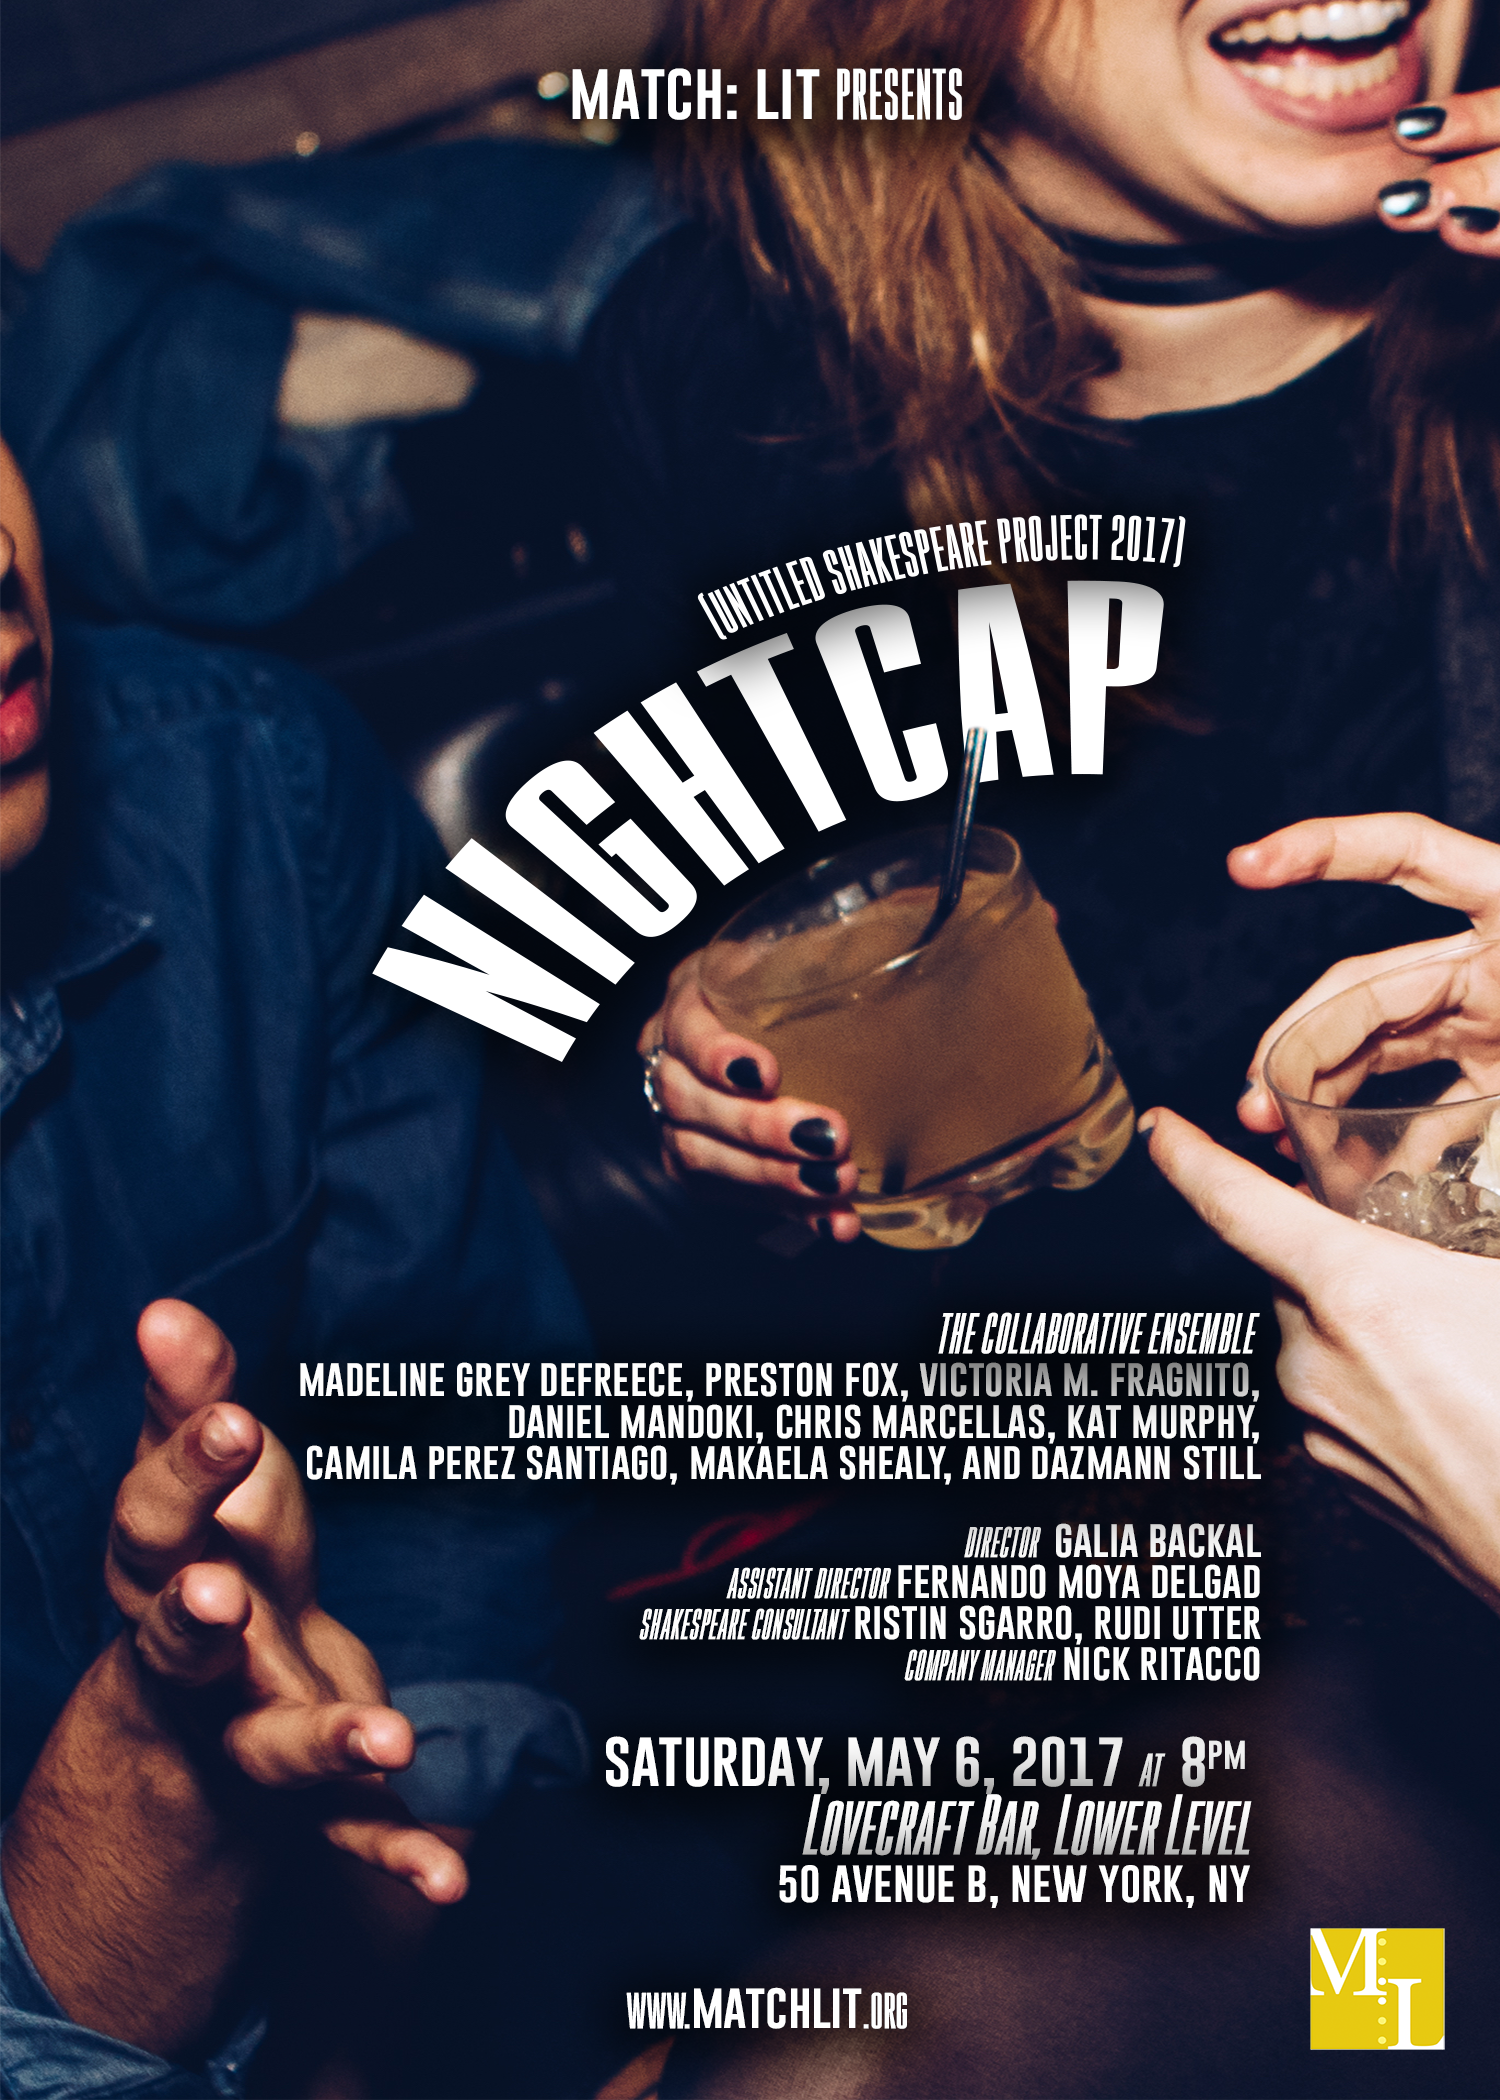 NightcapPOSTCARDv1.png